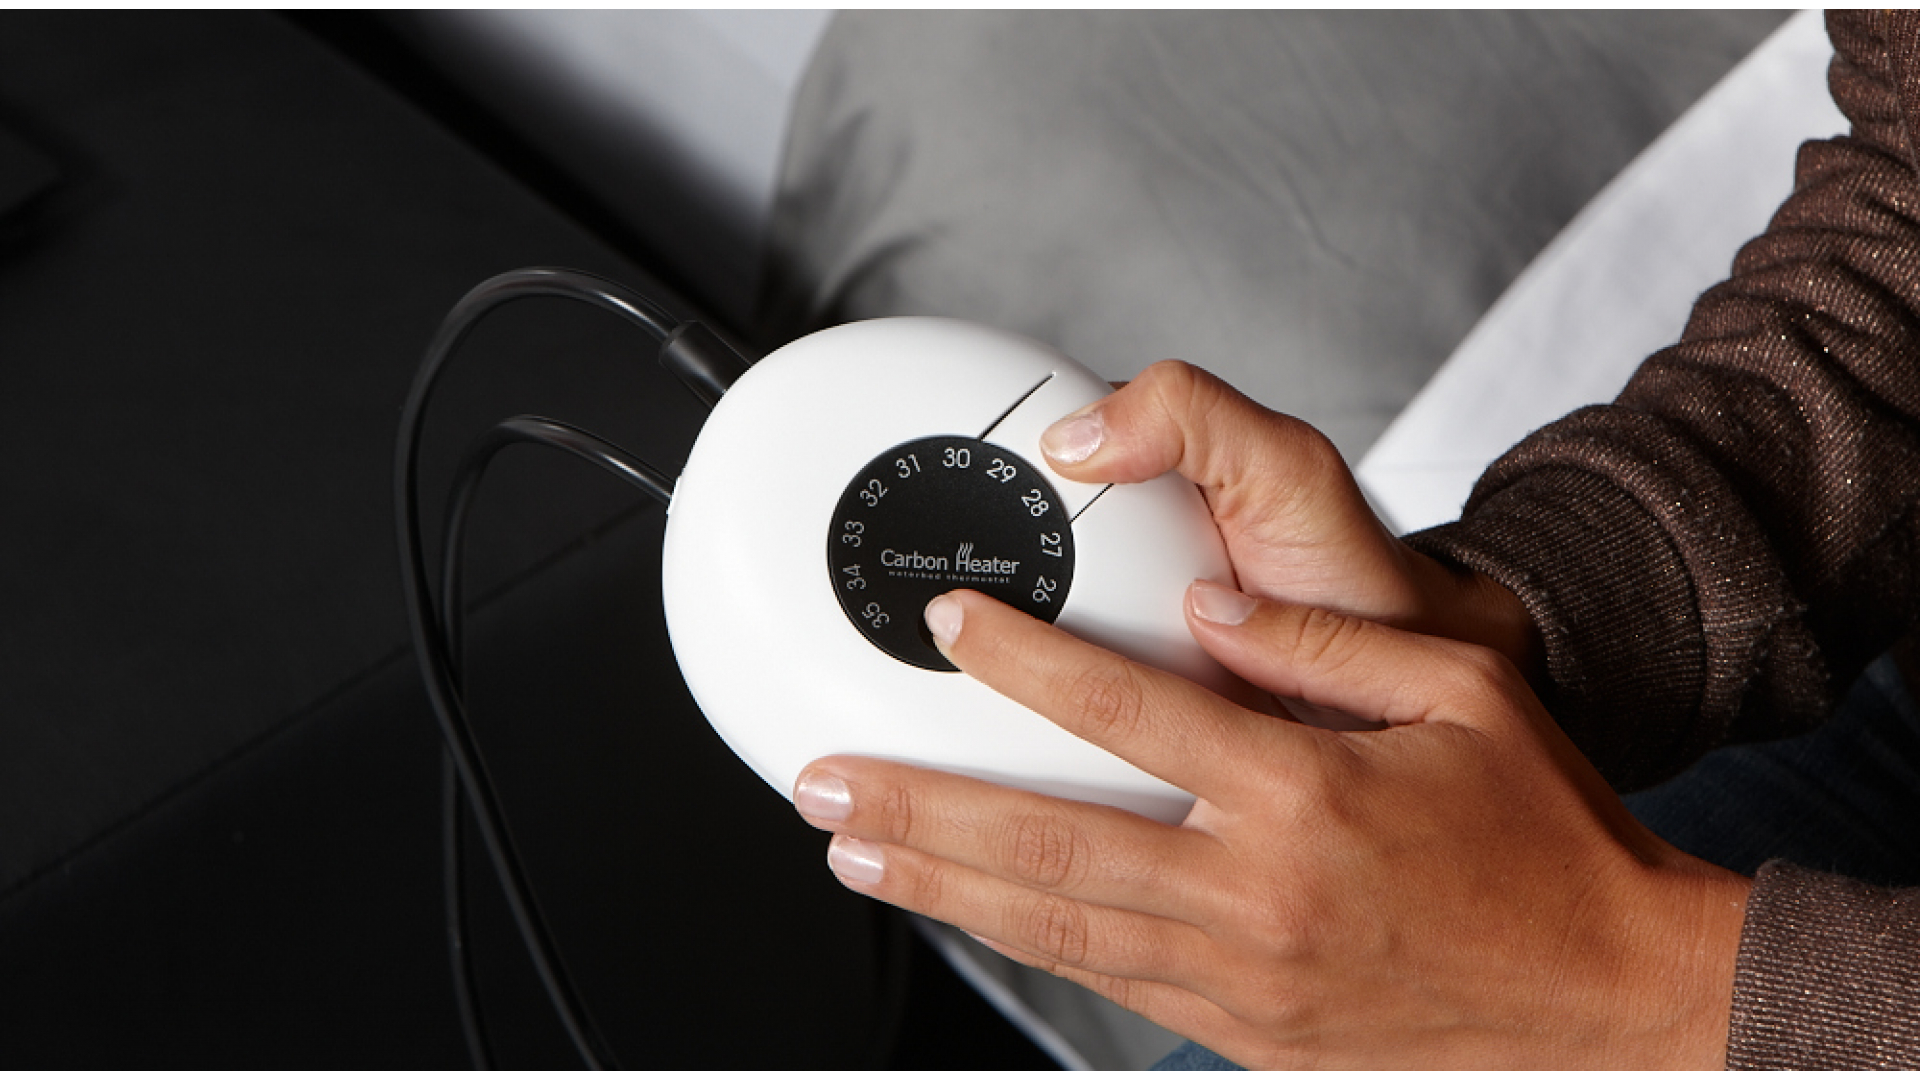 Wasserbett Heizung Carbon Classic thermostat